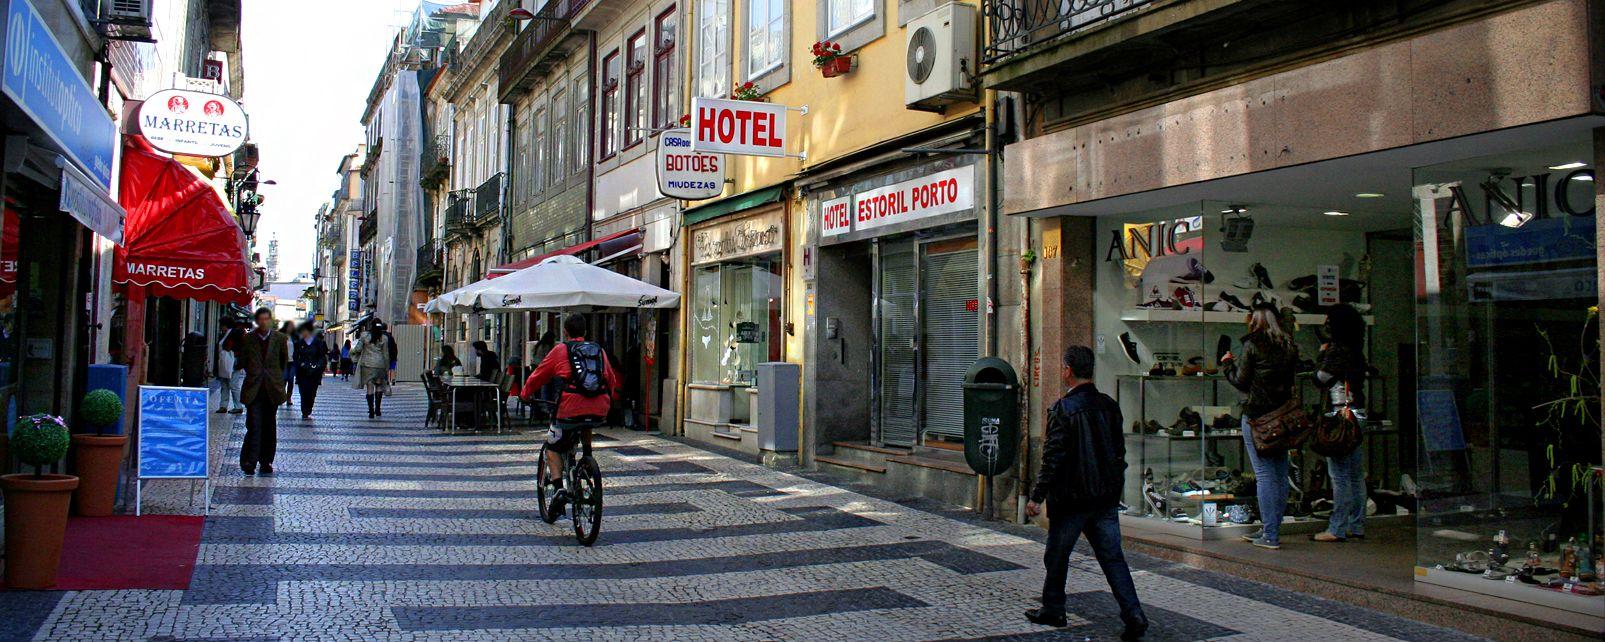 Hôtel Residencial Estoril Hotel Porto